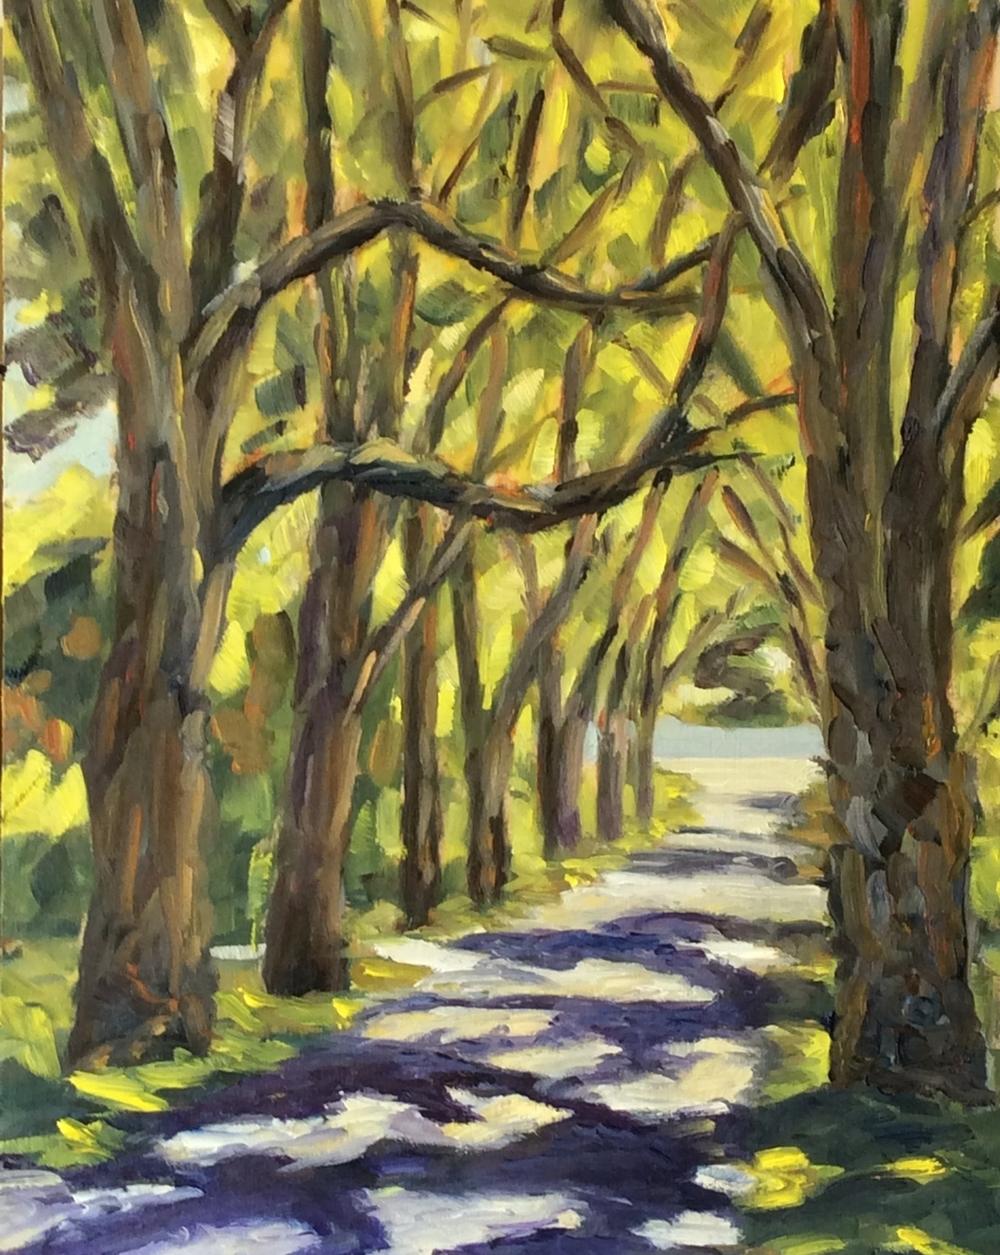 Canopy in Light   Oil 14 x 11